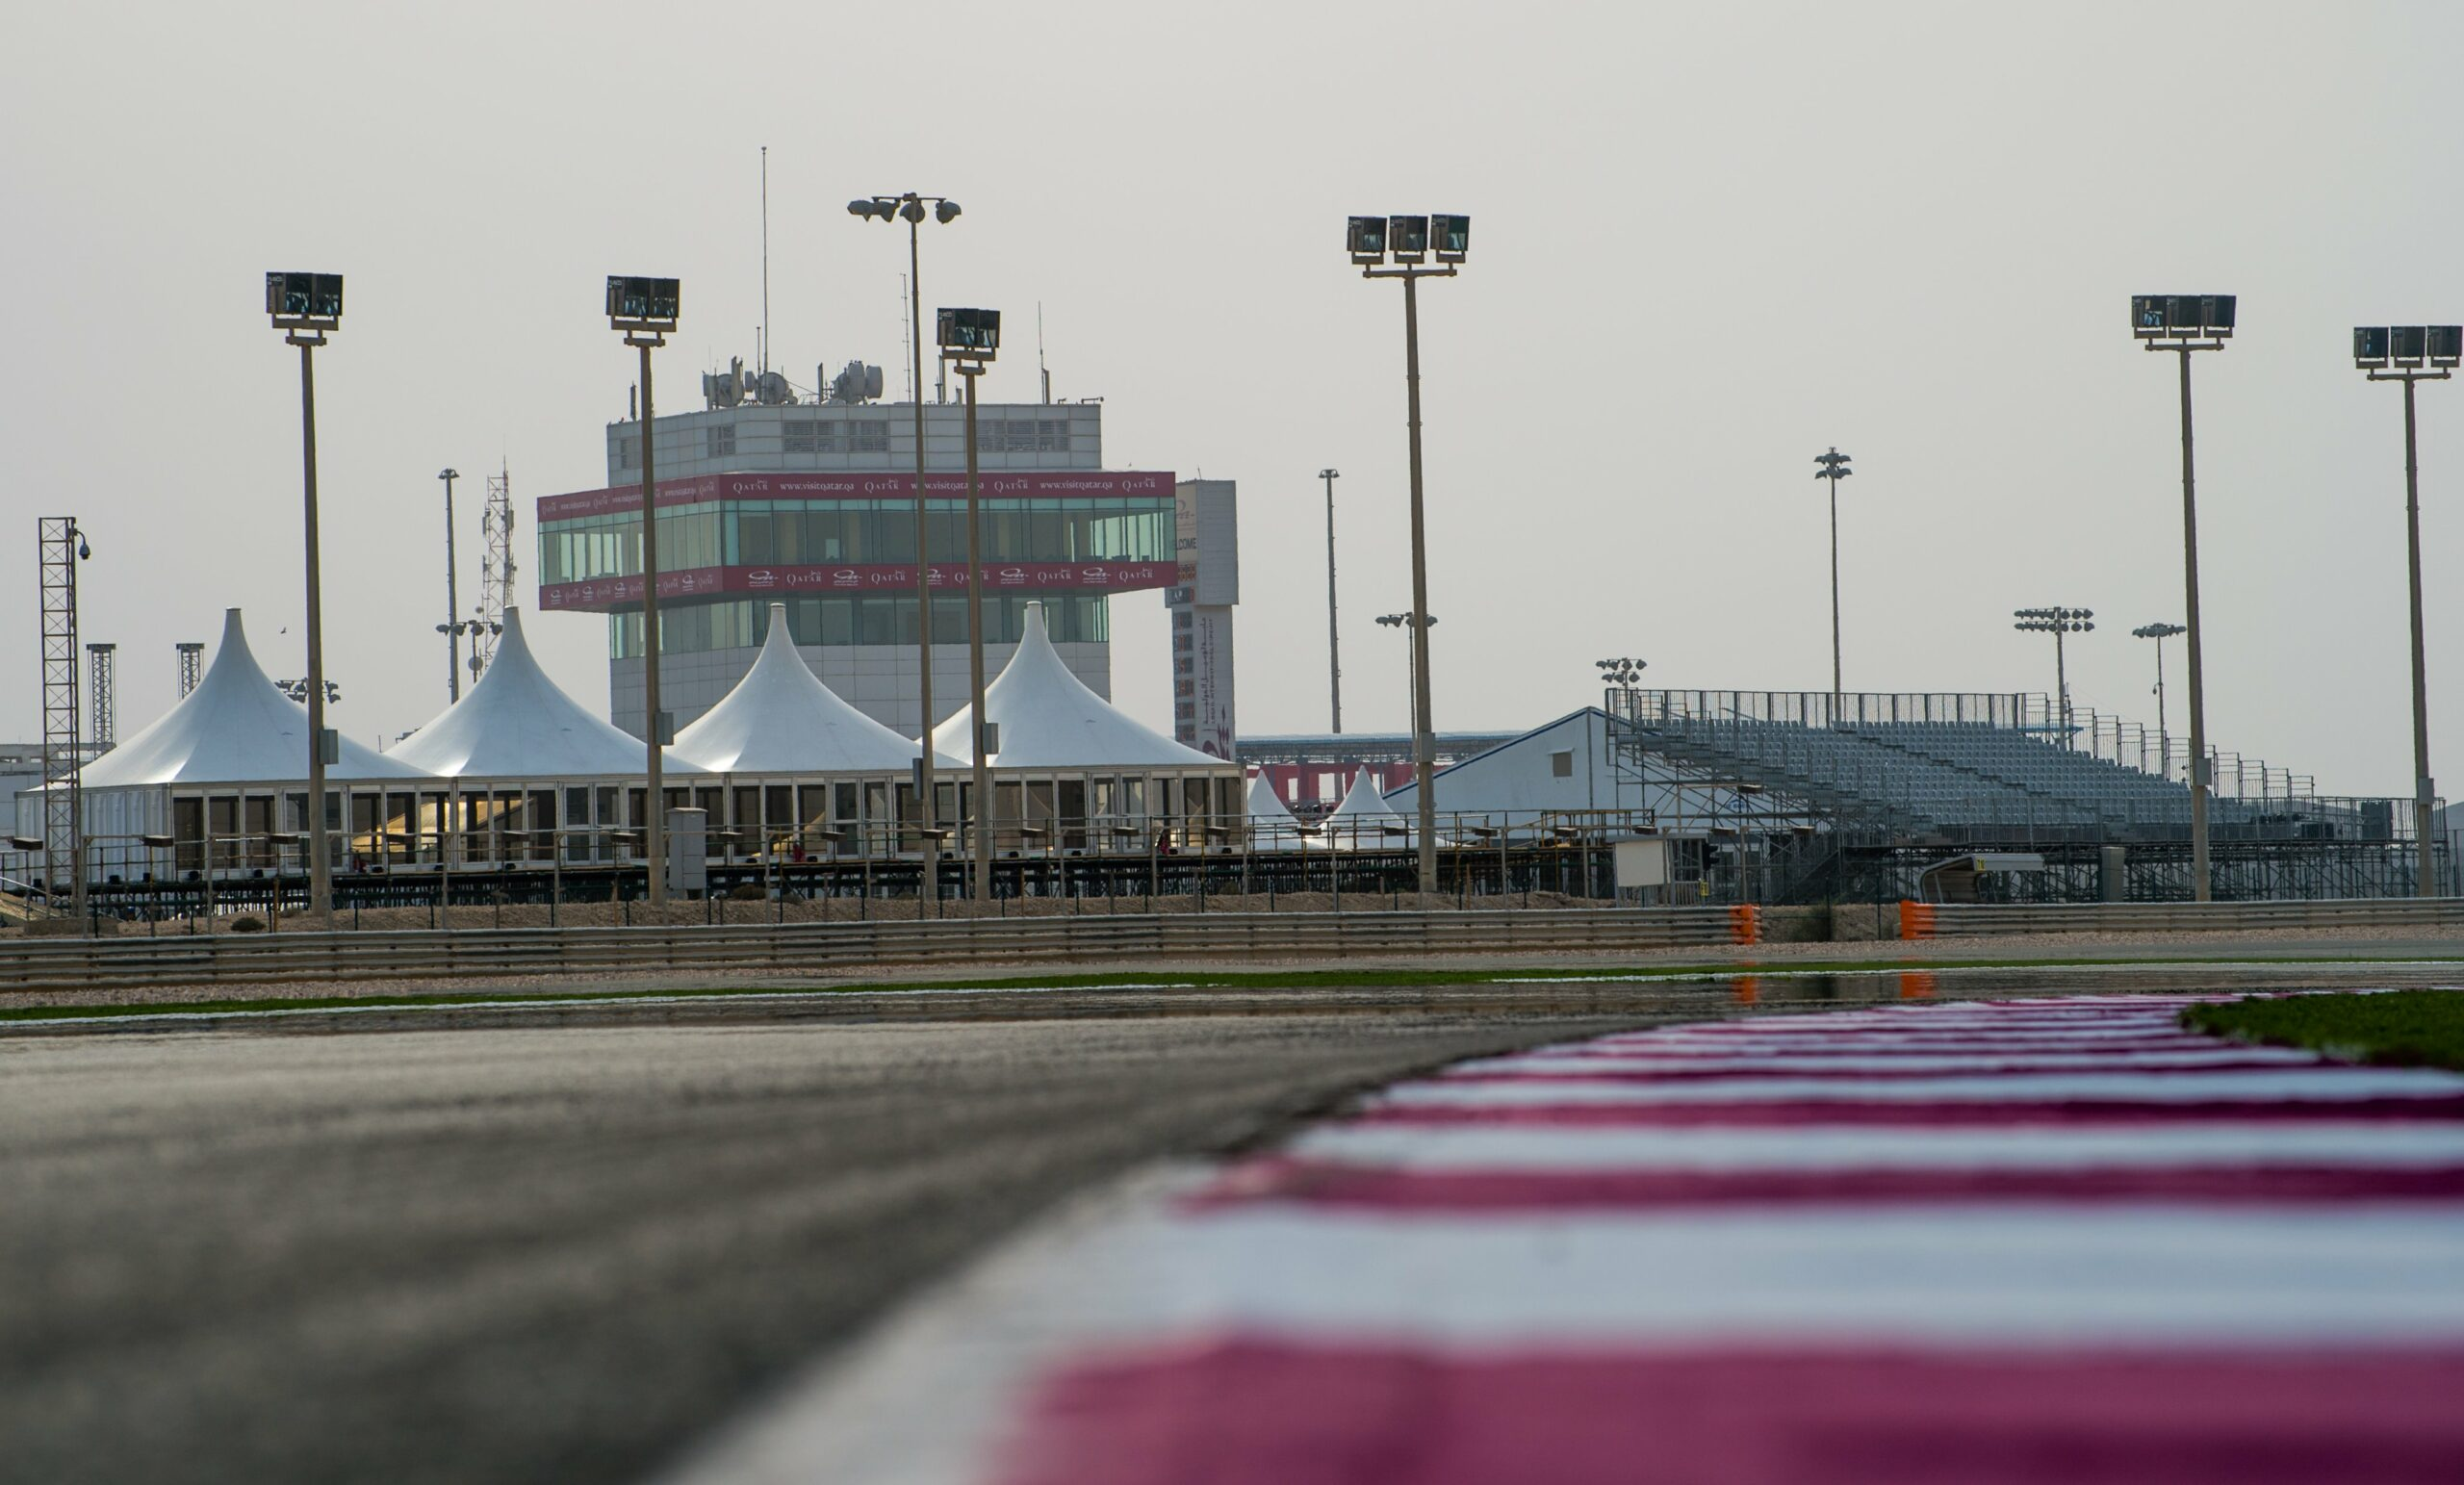 "F1 - <i class=""fab fa-youtube""></i> Onboard en F1 sur le tracé de Losail au Qatar"